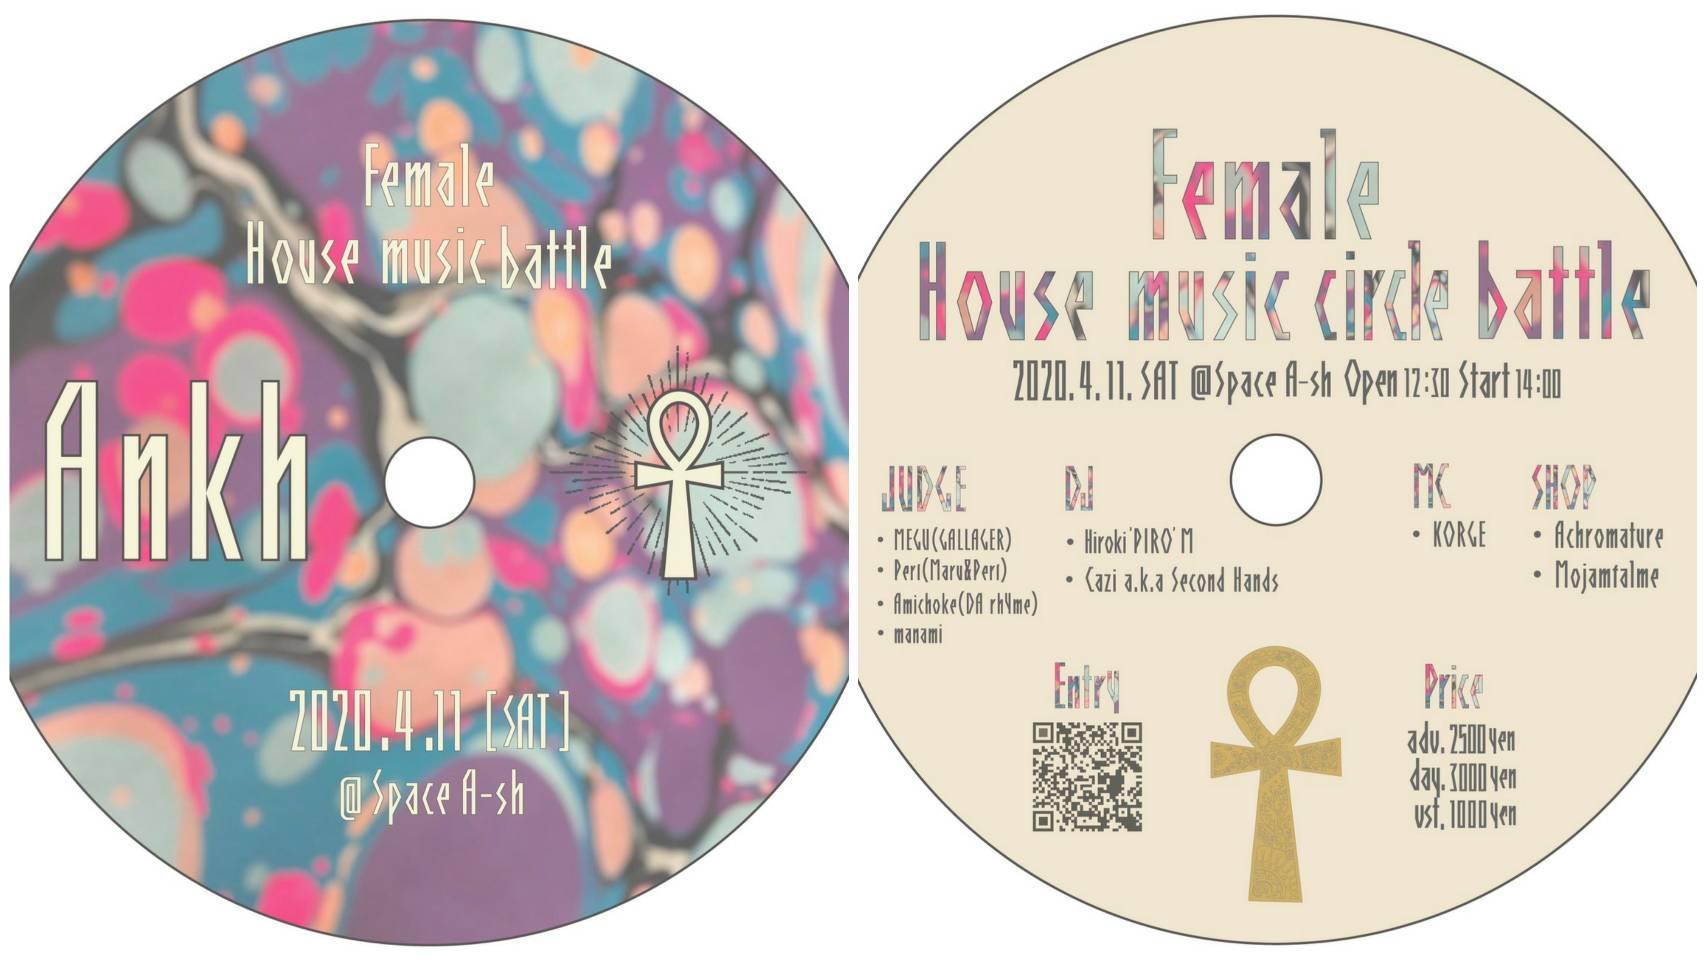 Female House music battle Ankh